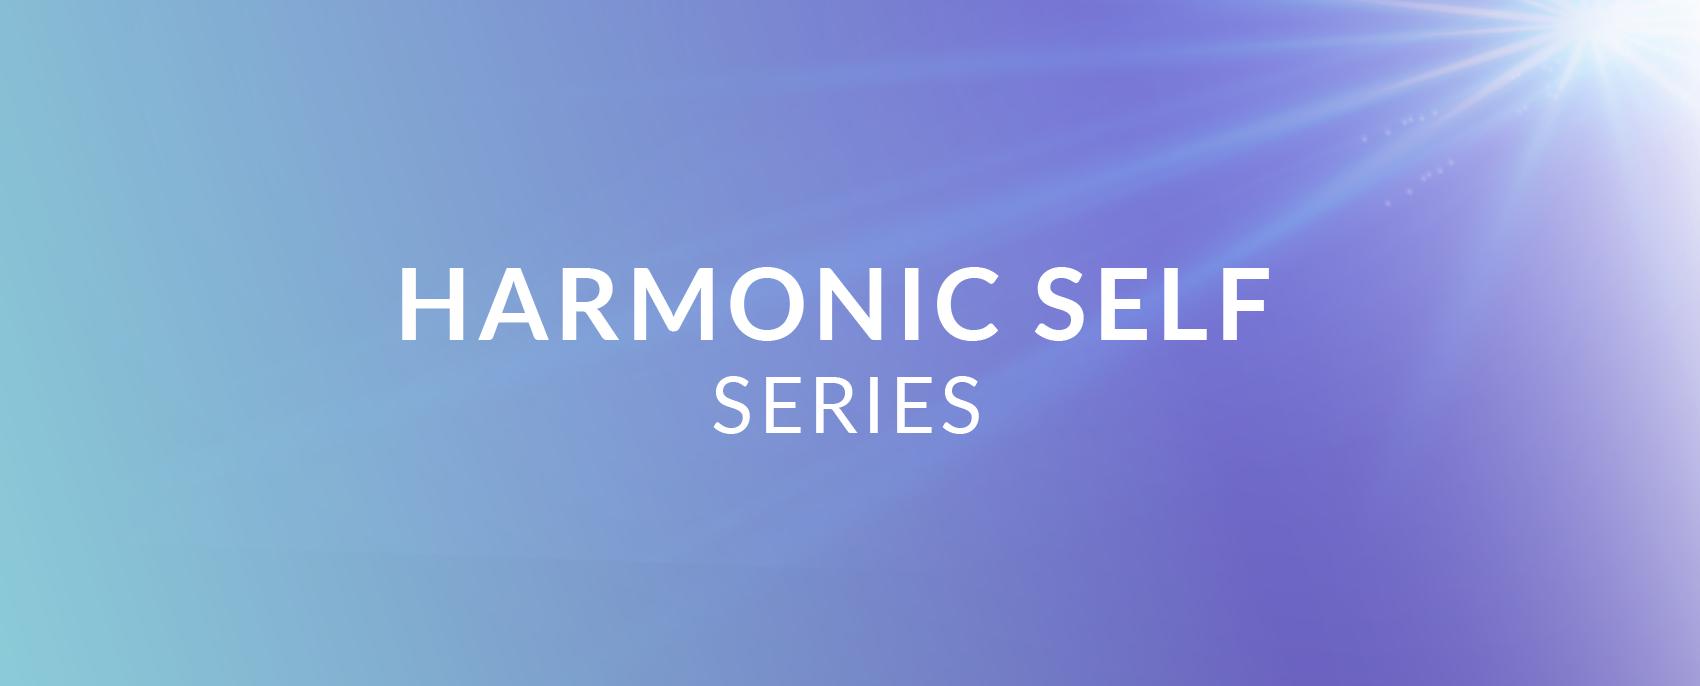 Harmonic Self Series